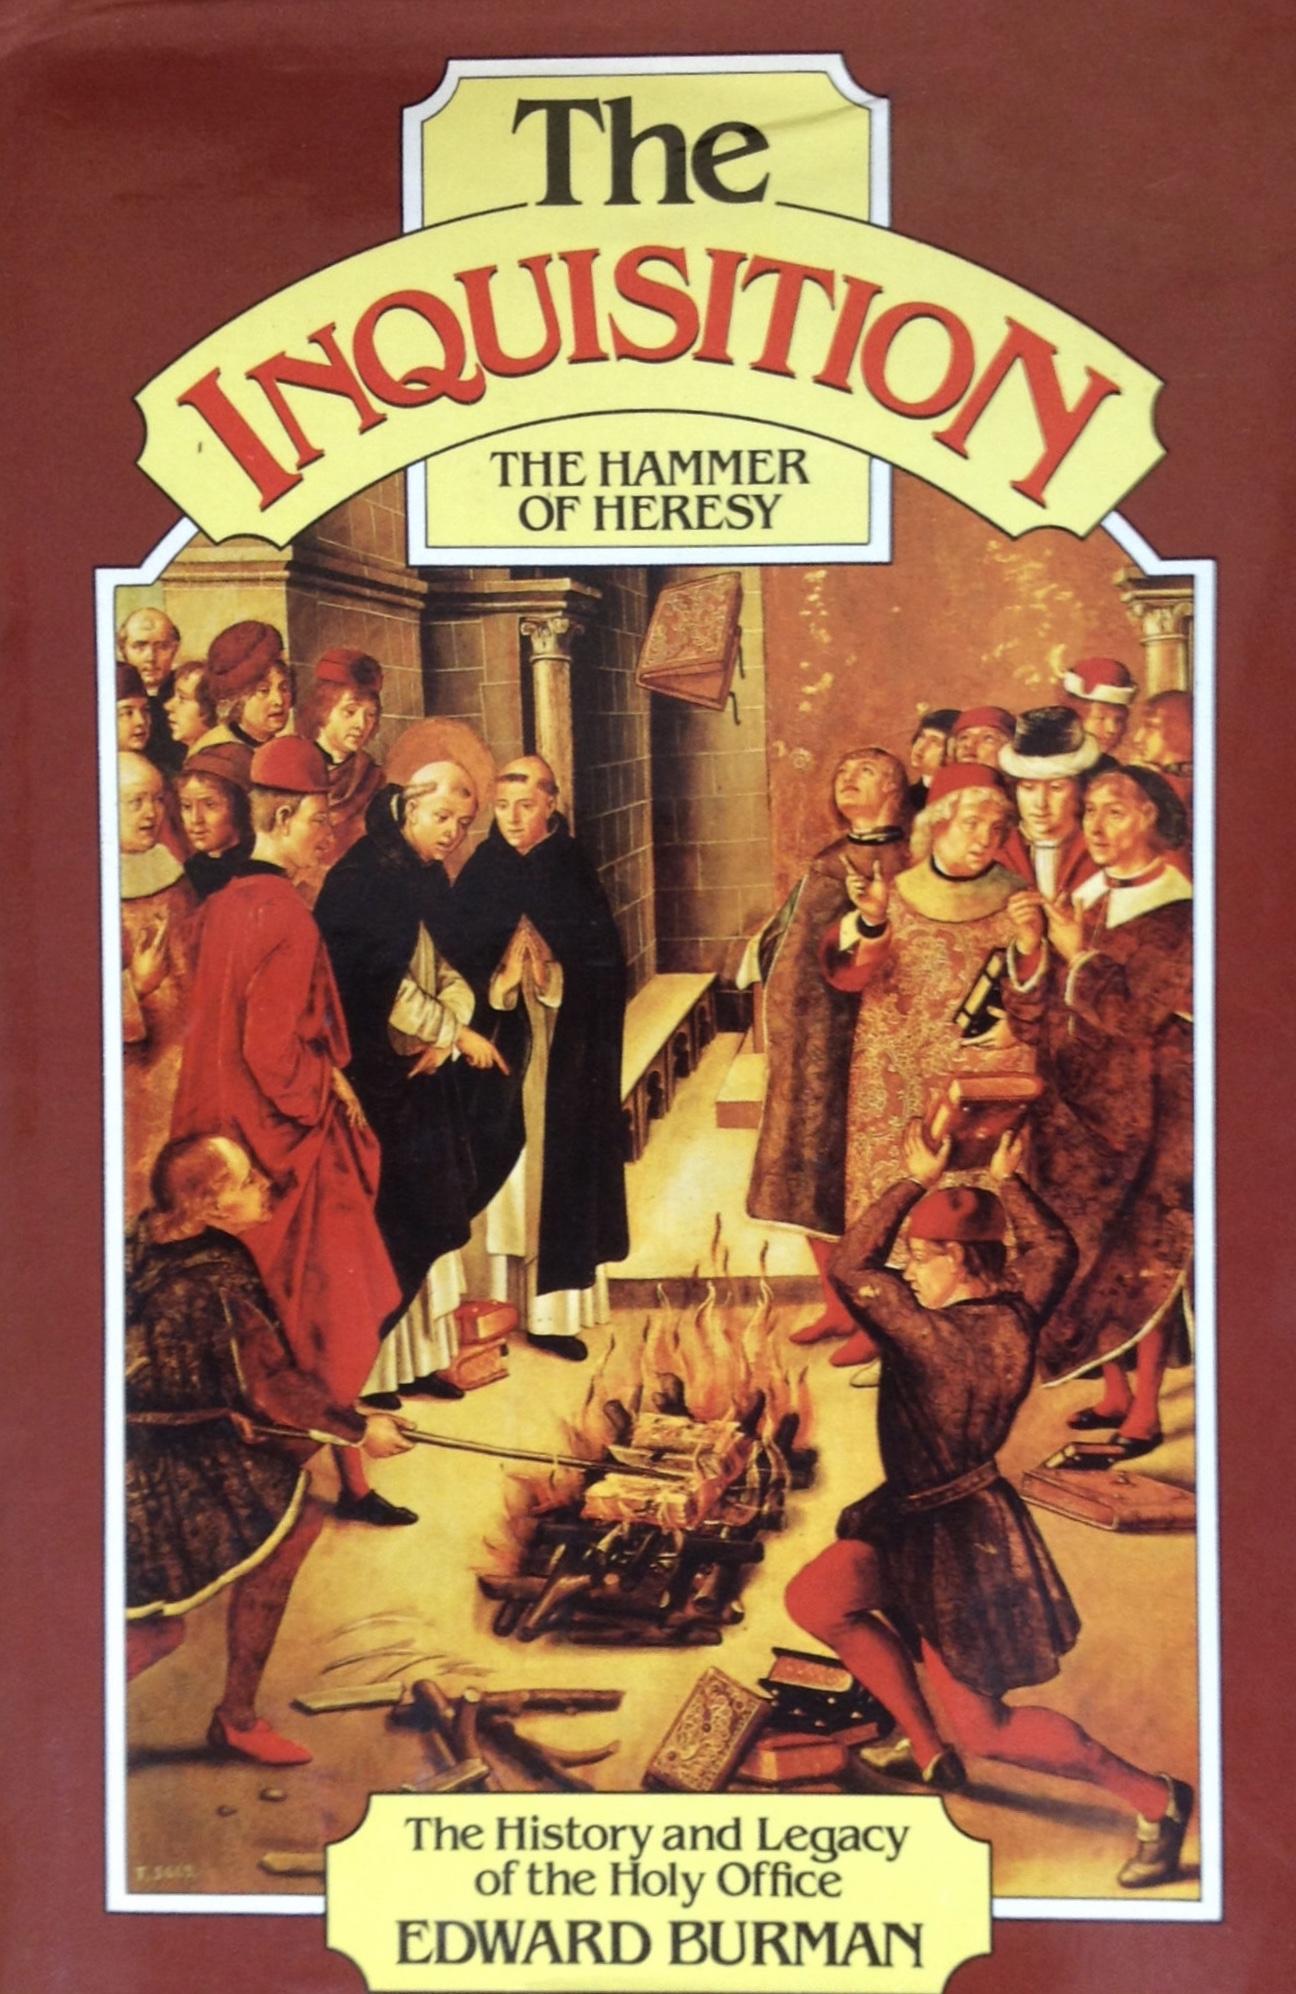 The original hardback edition, 1984